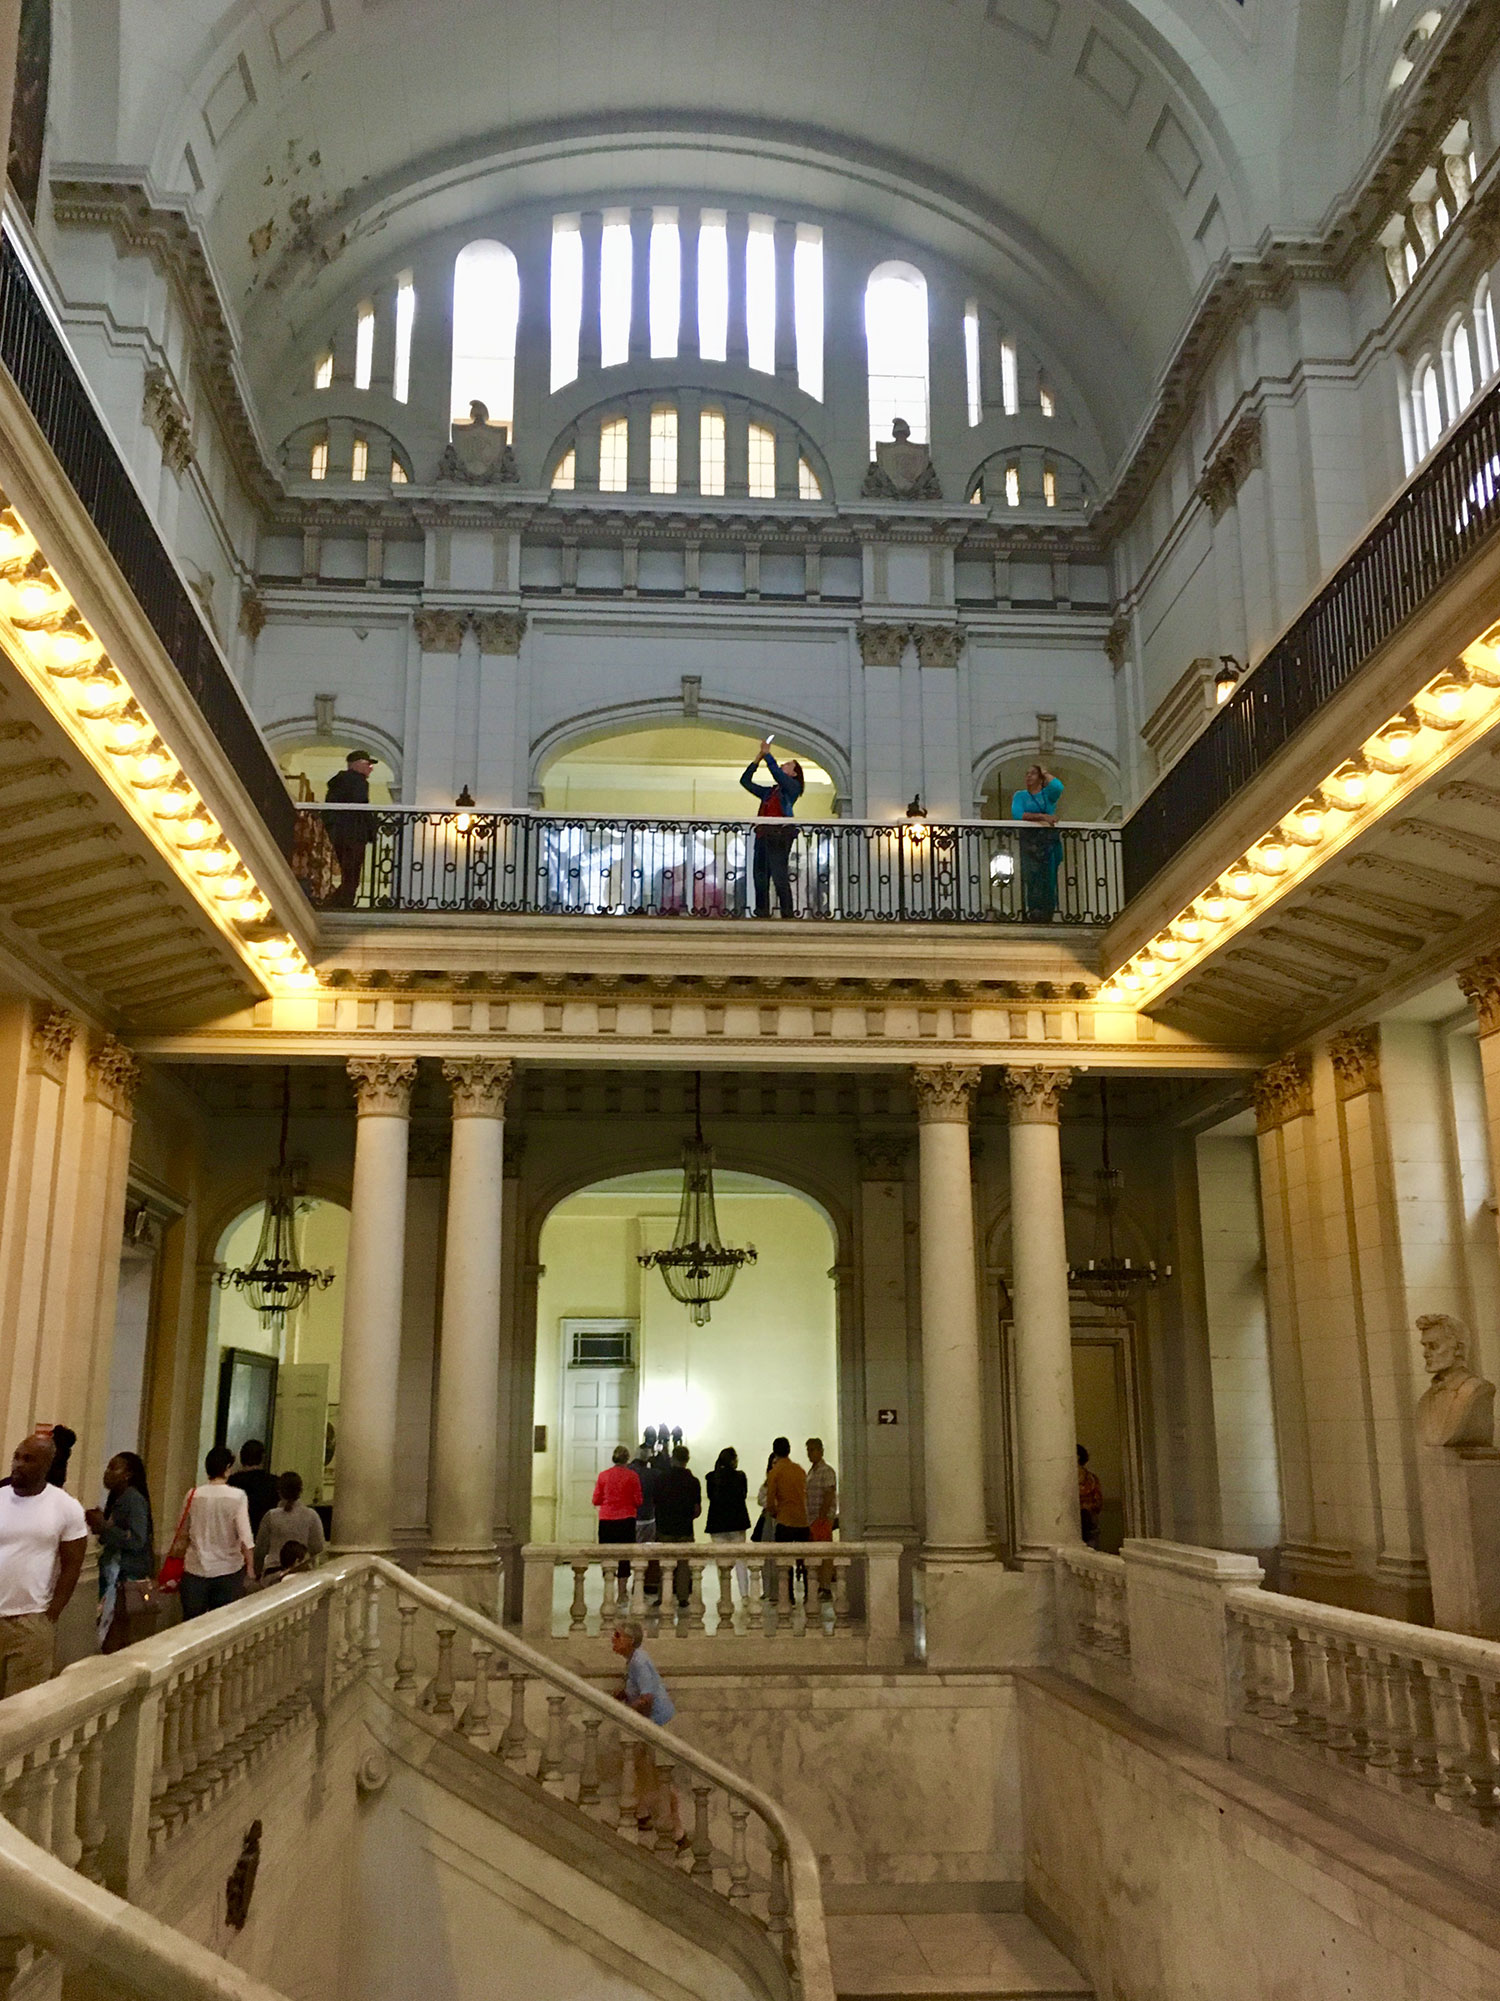 Hammocks_and_Ruins_What_to_Do_Cuba_Havana_island_museum_of_revolution_10.jpg